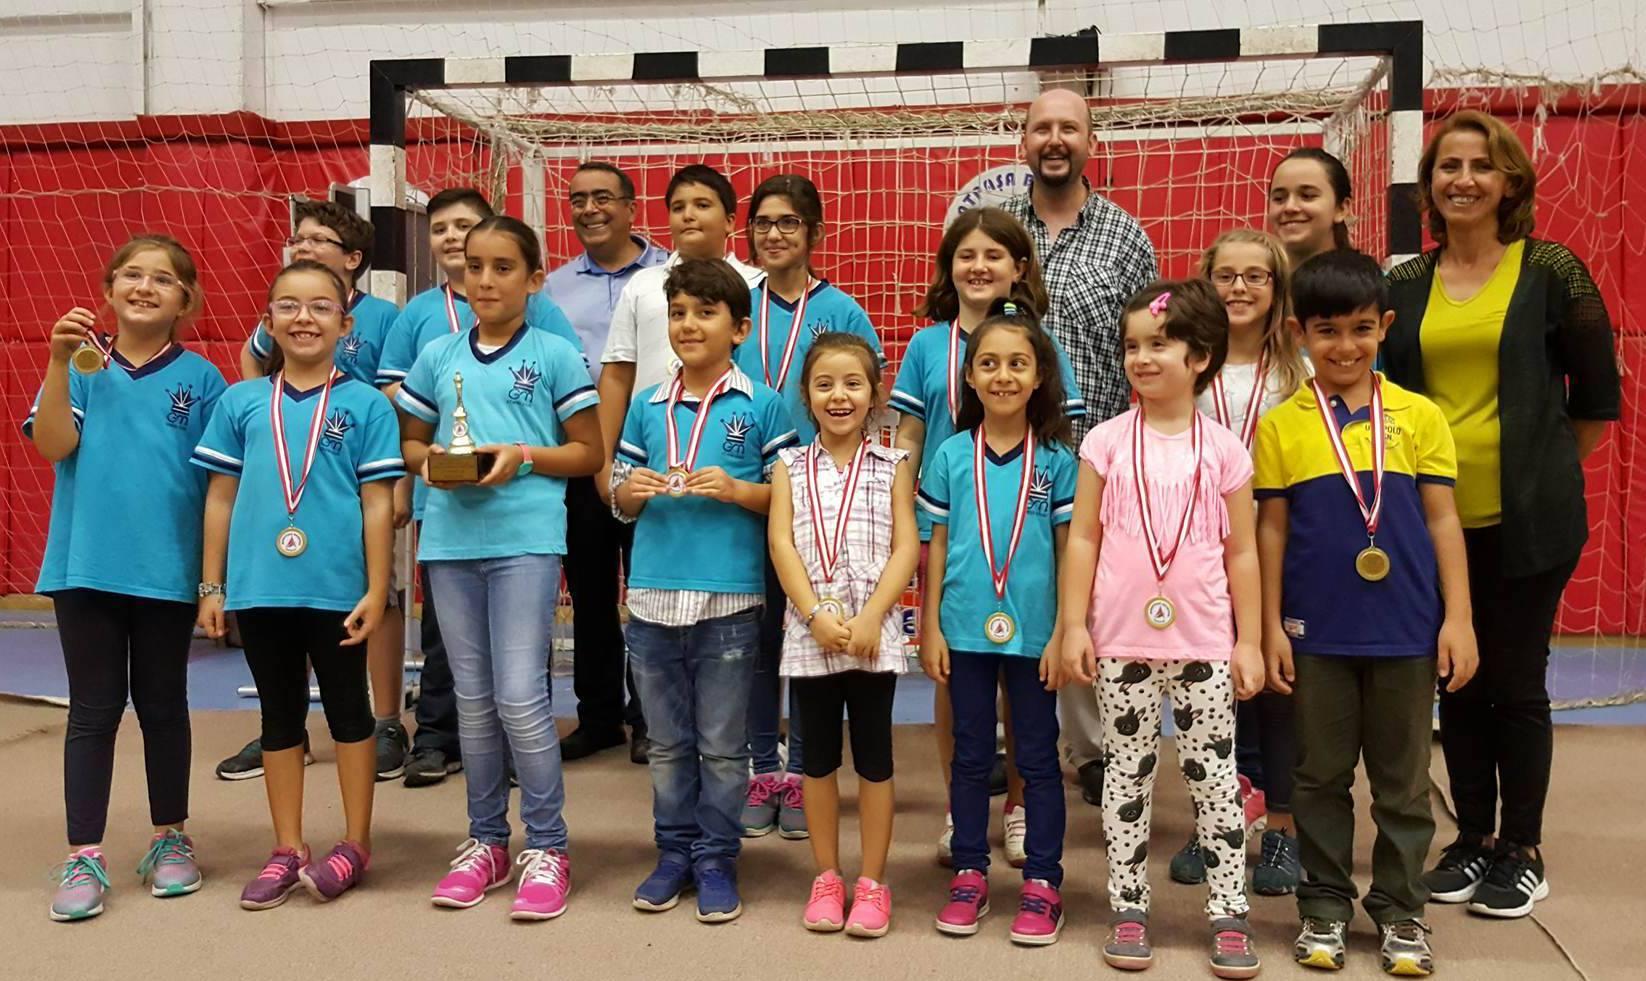 2016 Antalya Cumhuriyet Bayramı Satranç Turnuvası Ödül Töreni 30.10.2016